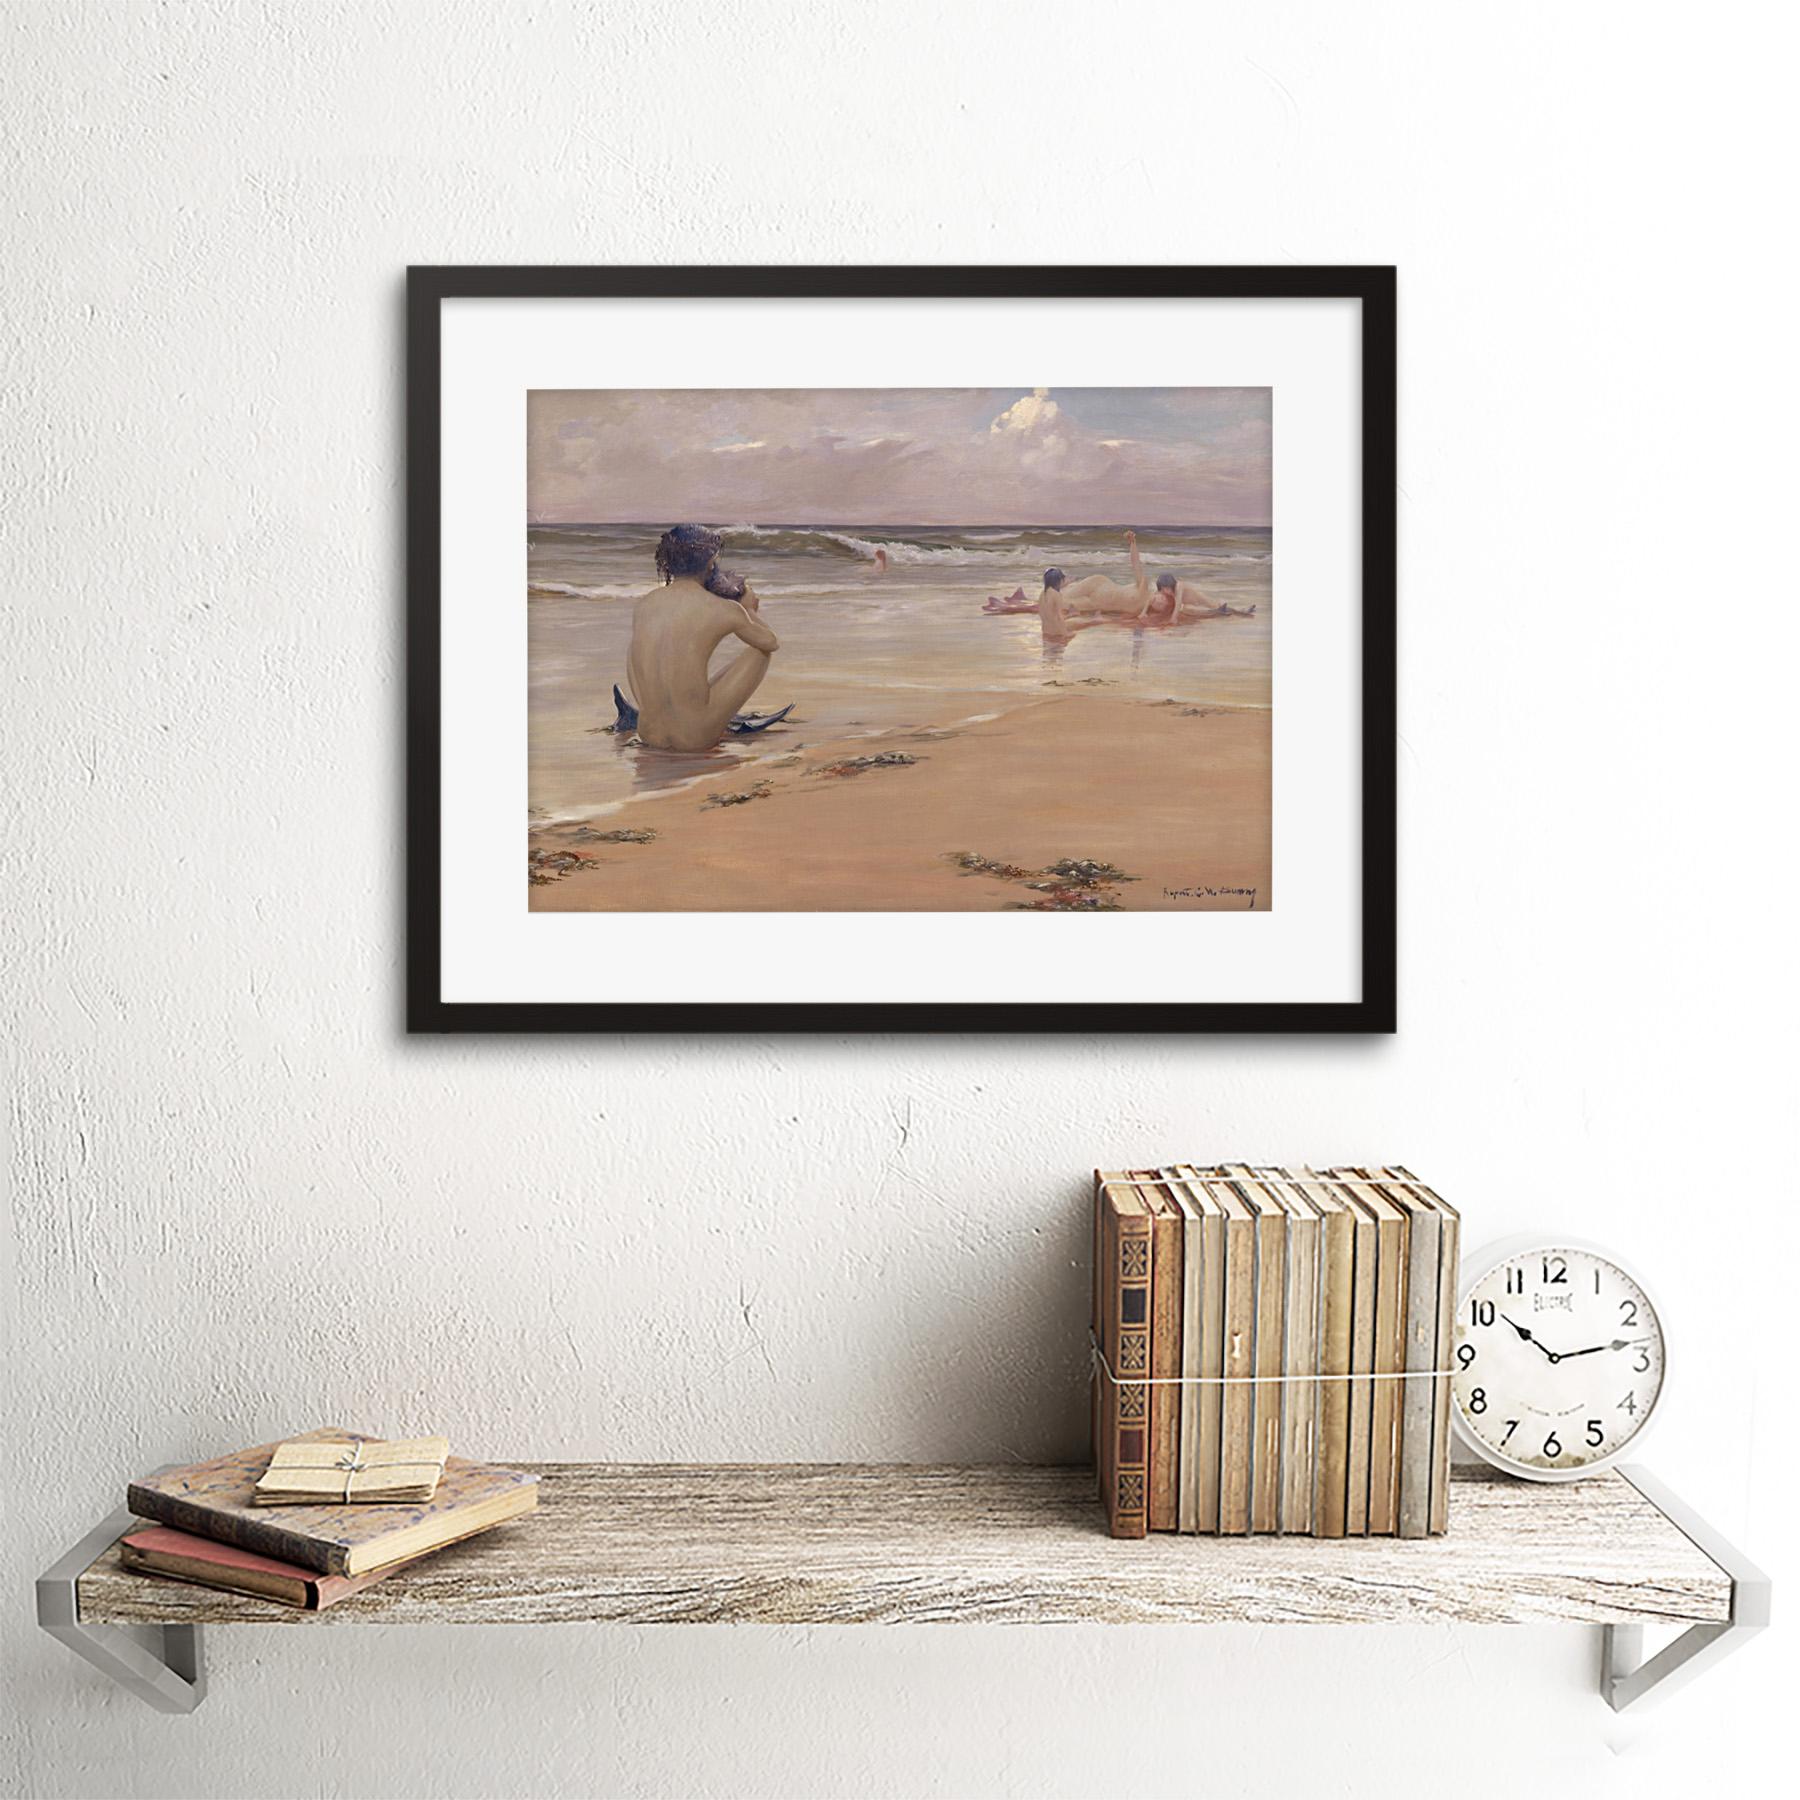 thumbnail 3 - Rupert Bunny Sea Idyll 1891 Old Painting Framed Art Print 12x16 Inch